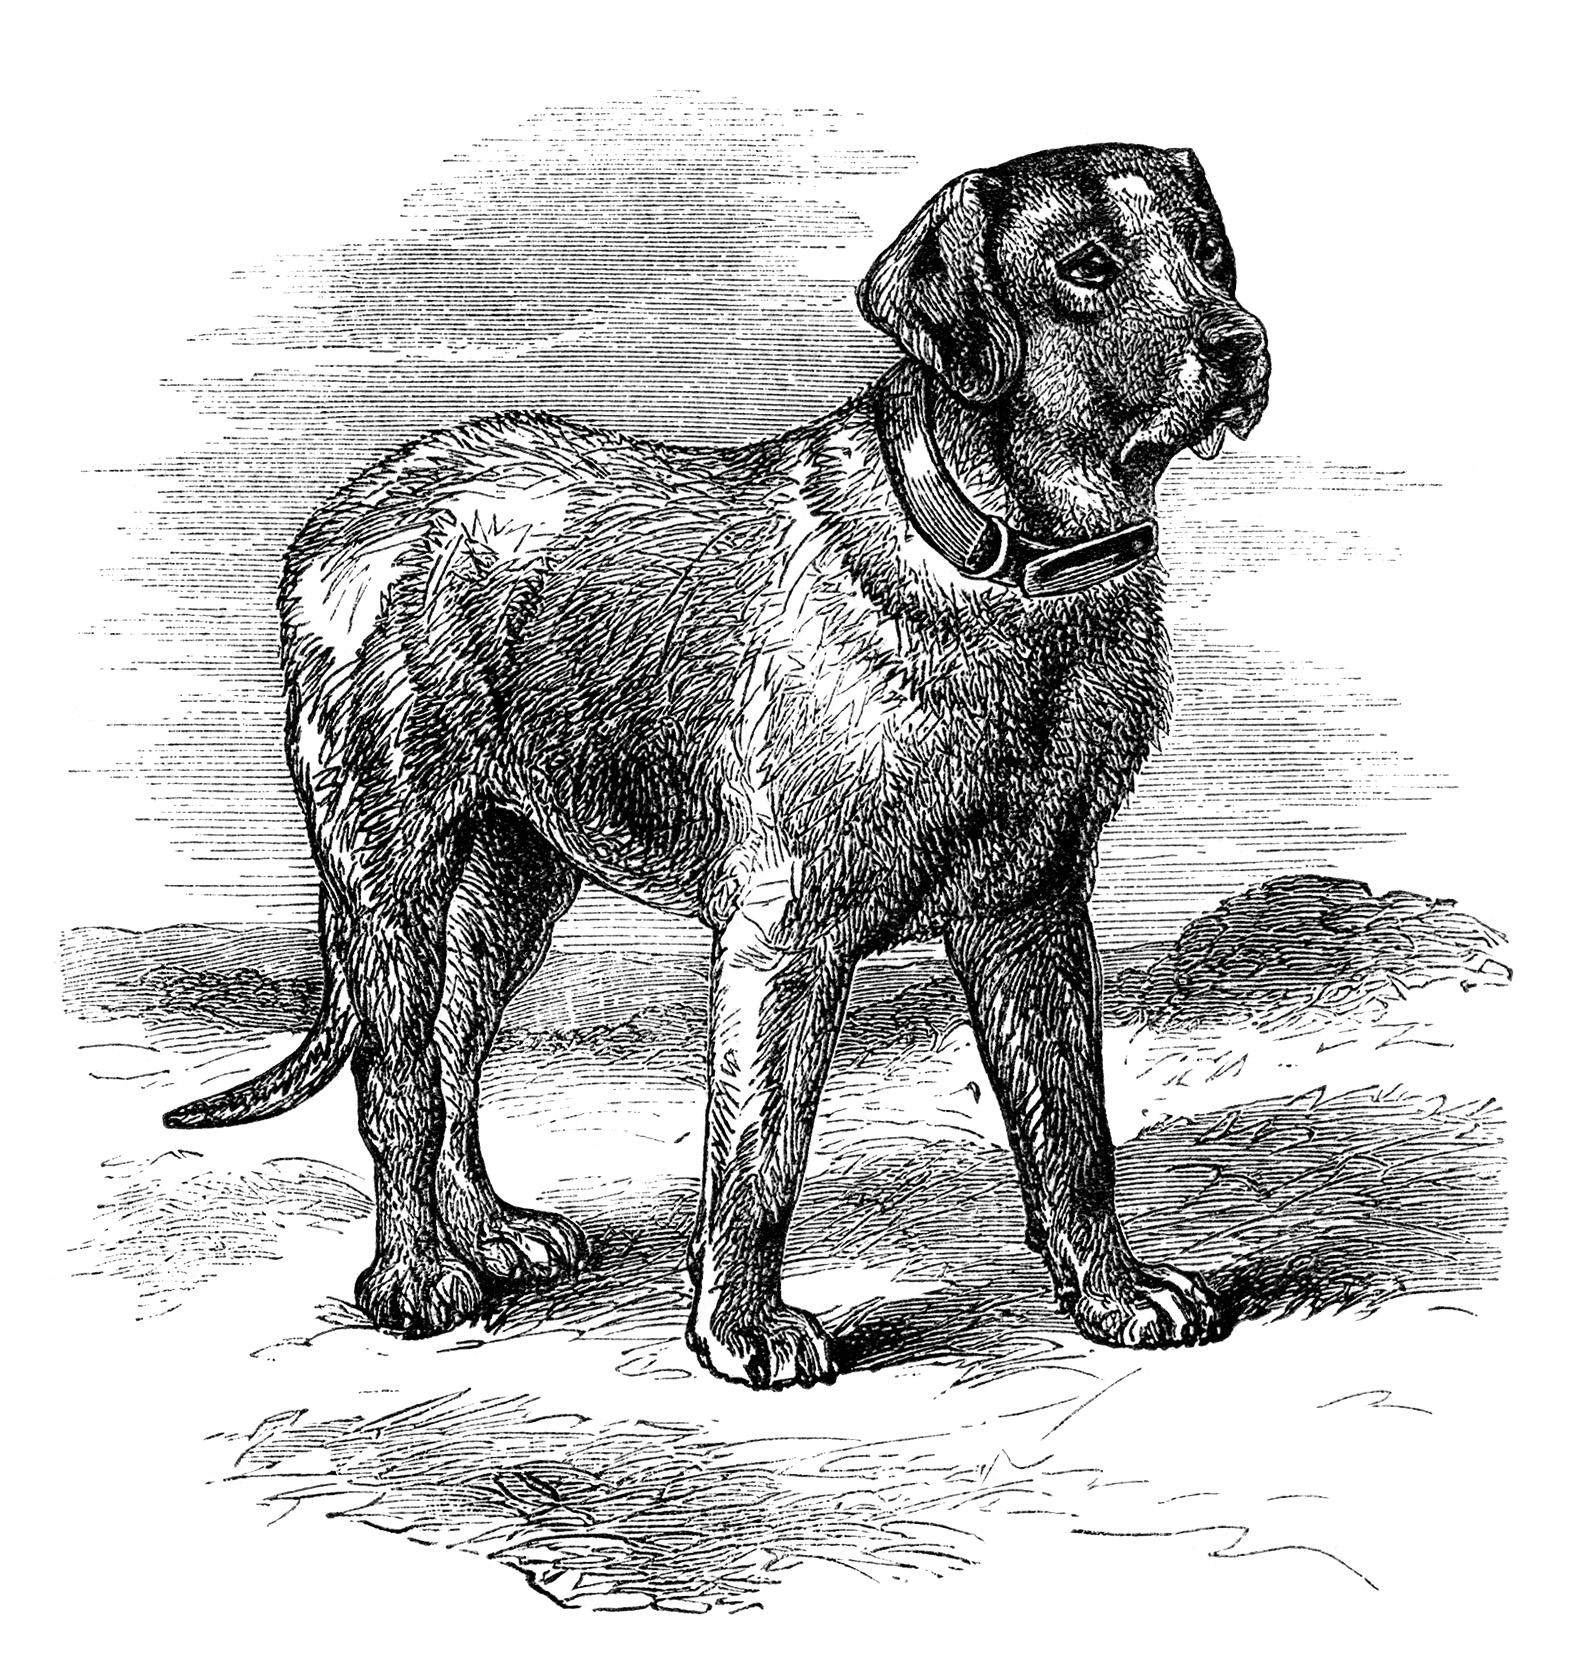 English Mastiff illustration, black and white clip art, vintage animal clipart, vintage dog image, mastiff dog sketch